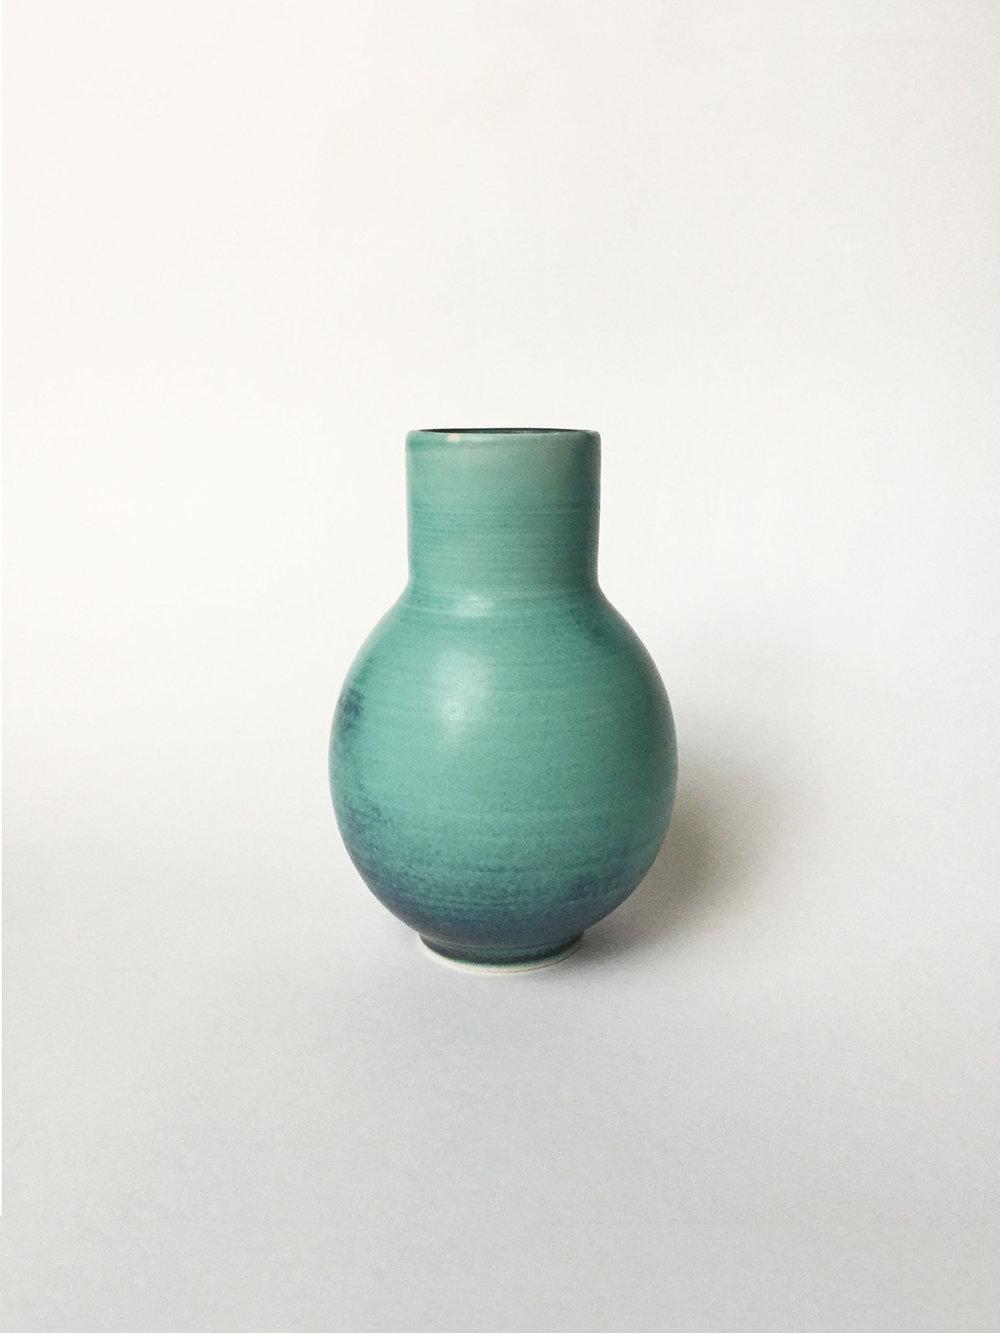 17-vase-turq-stove-02.jpg